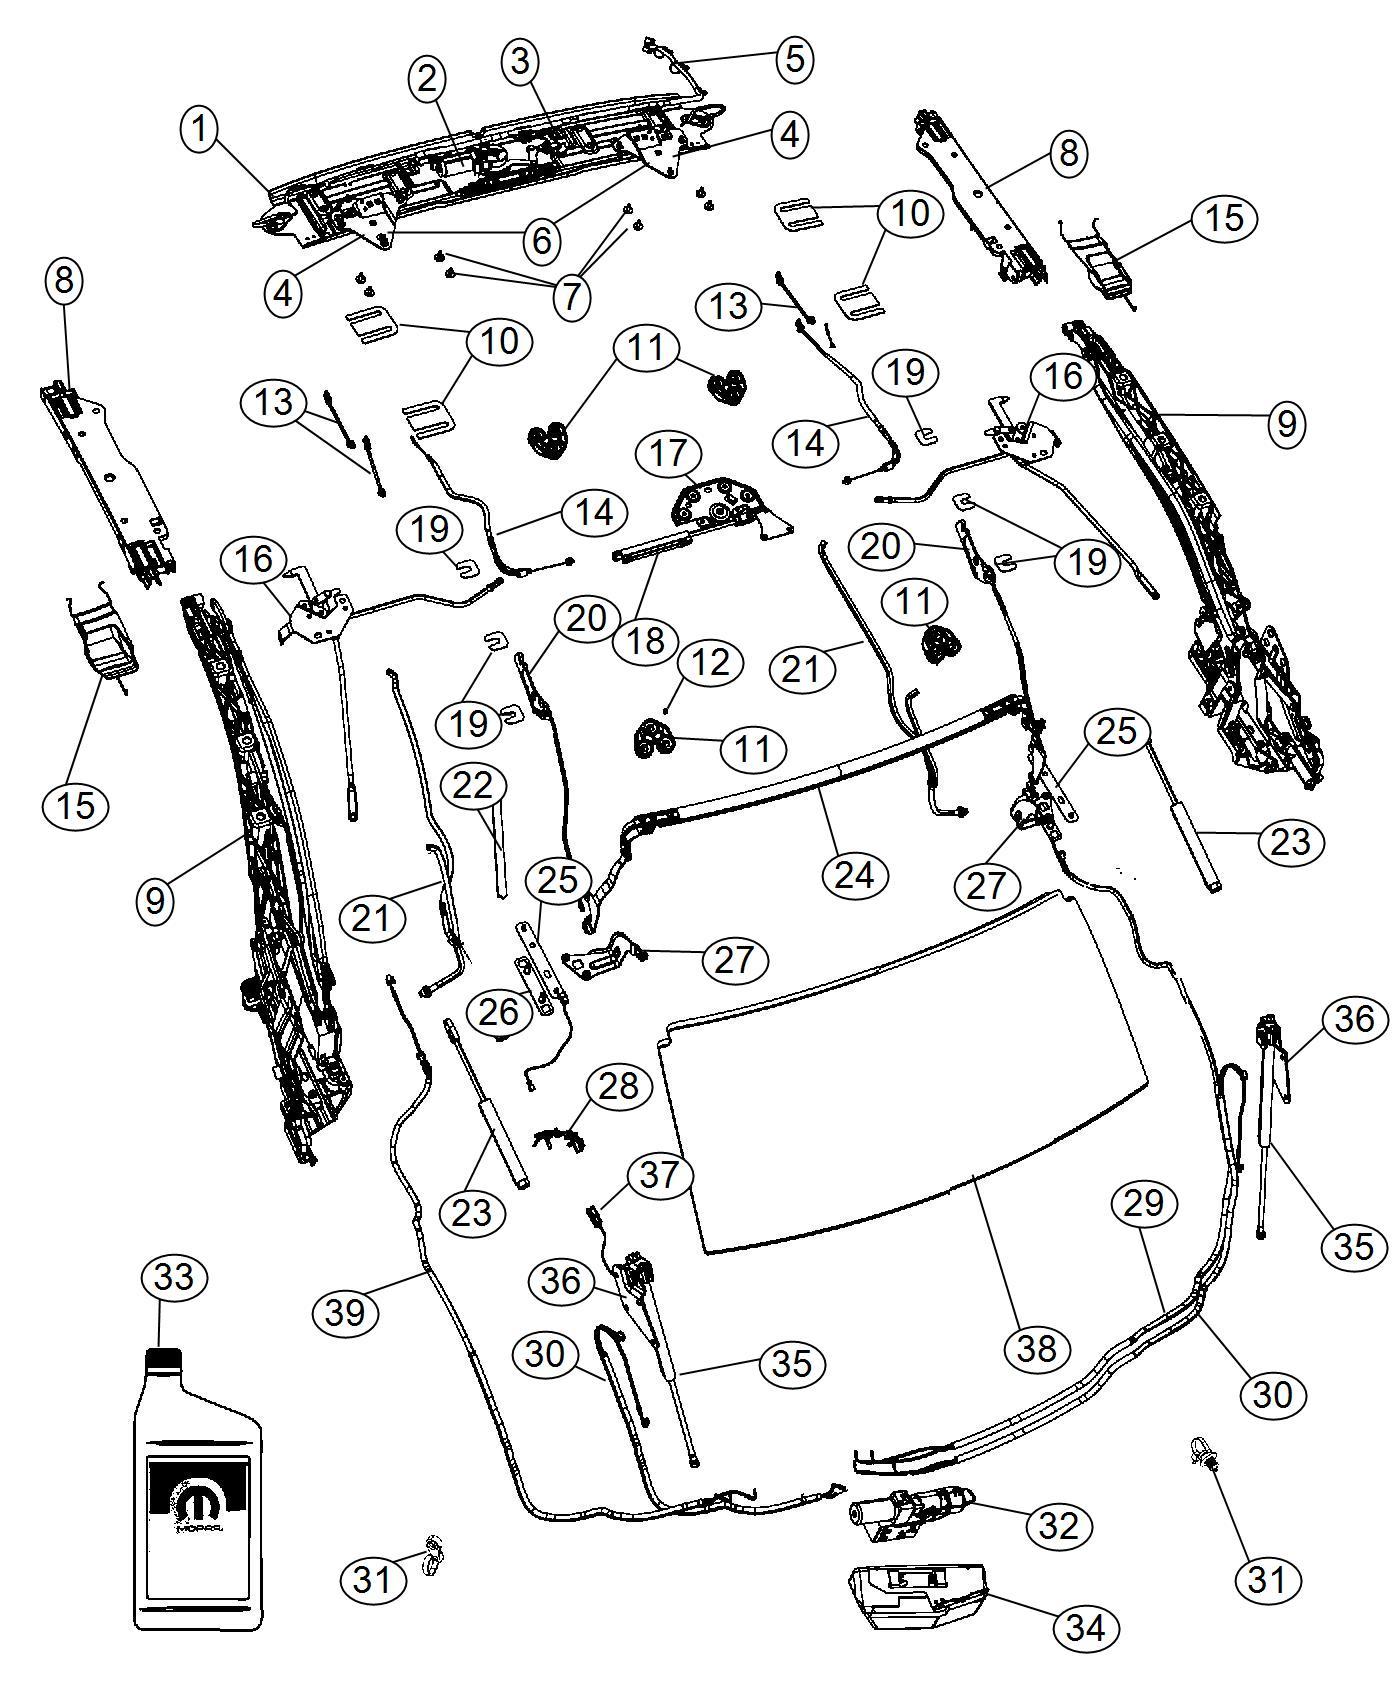 Chrysler 200 Plate Header Latch Top Attaching